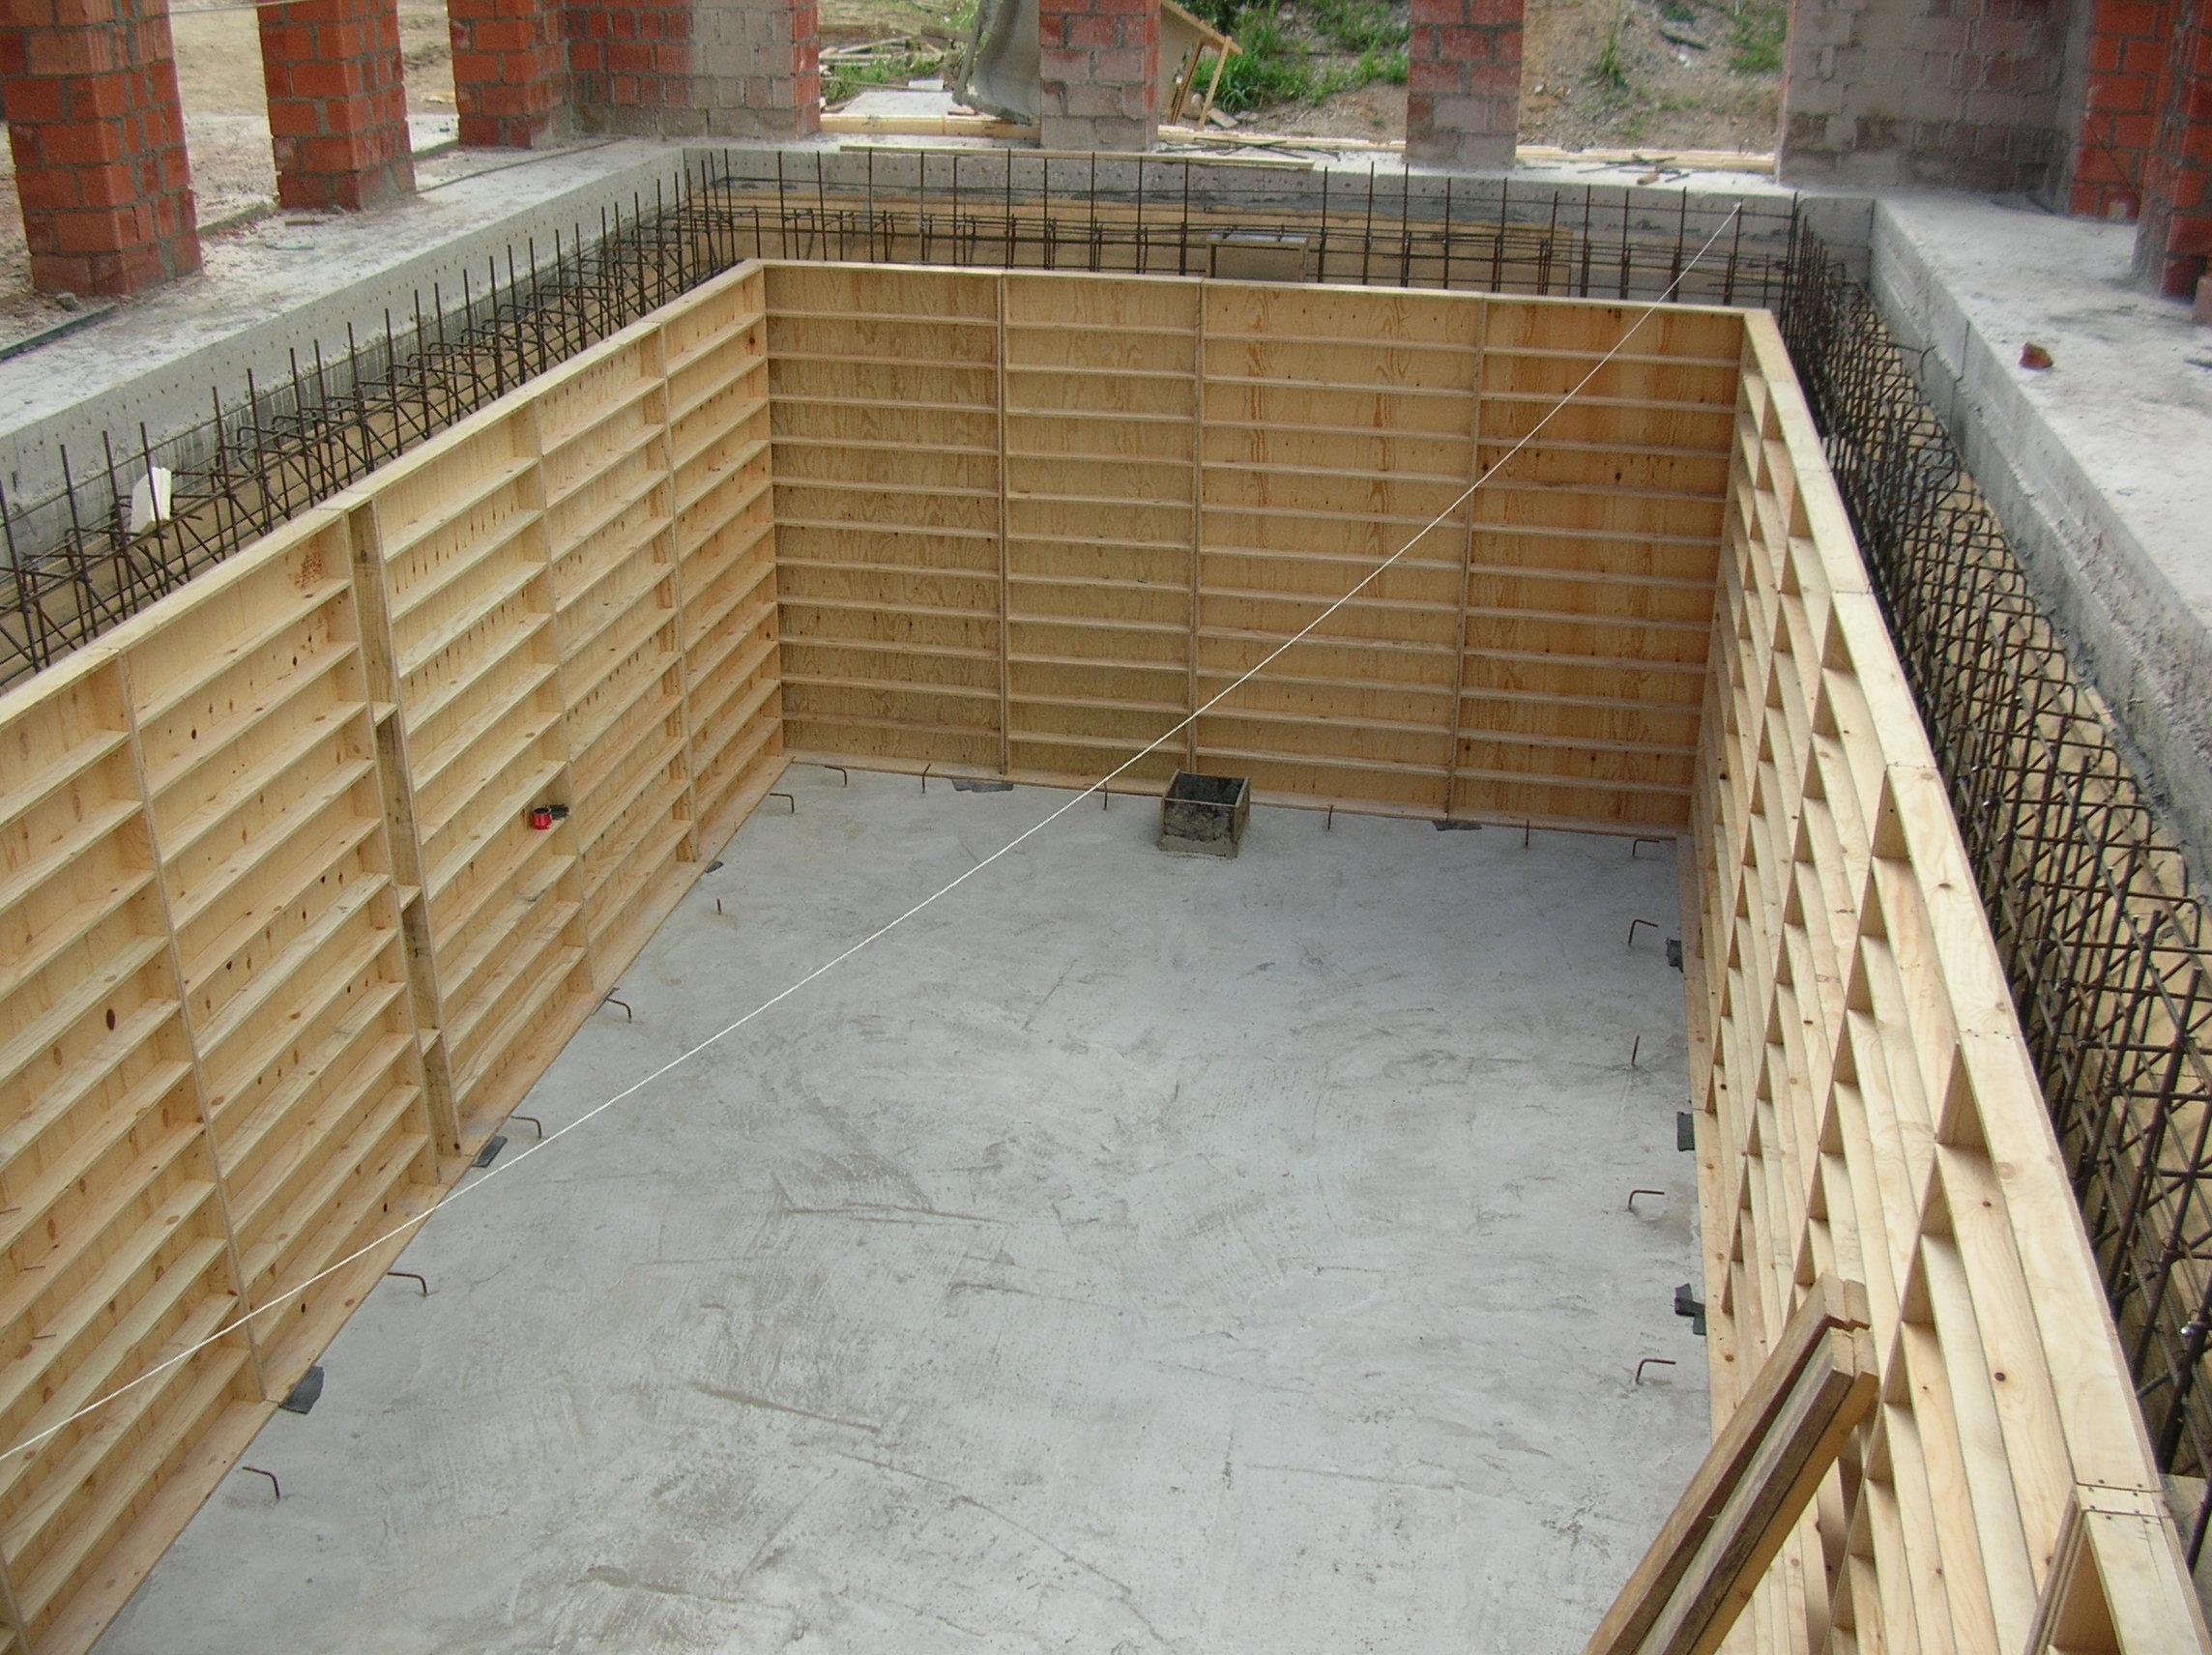 бассейн бетонный опалубка 2